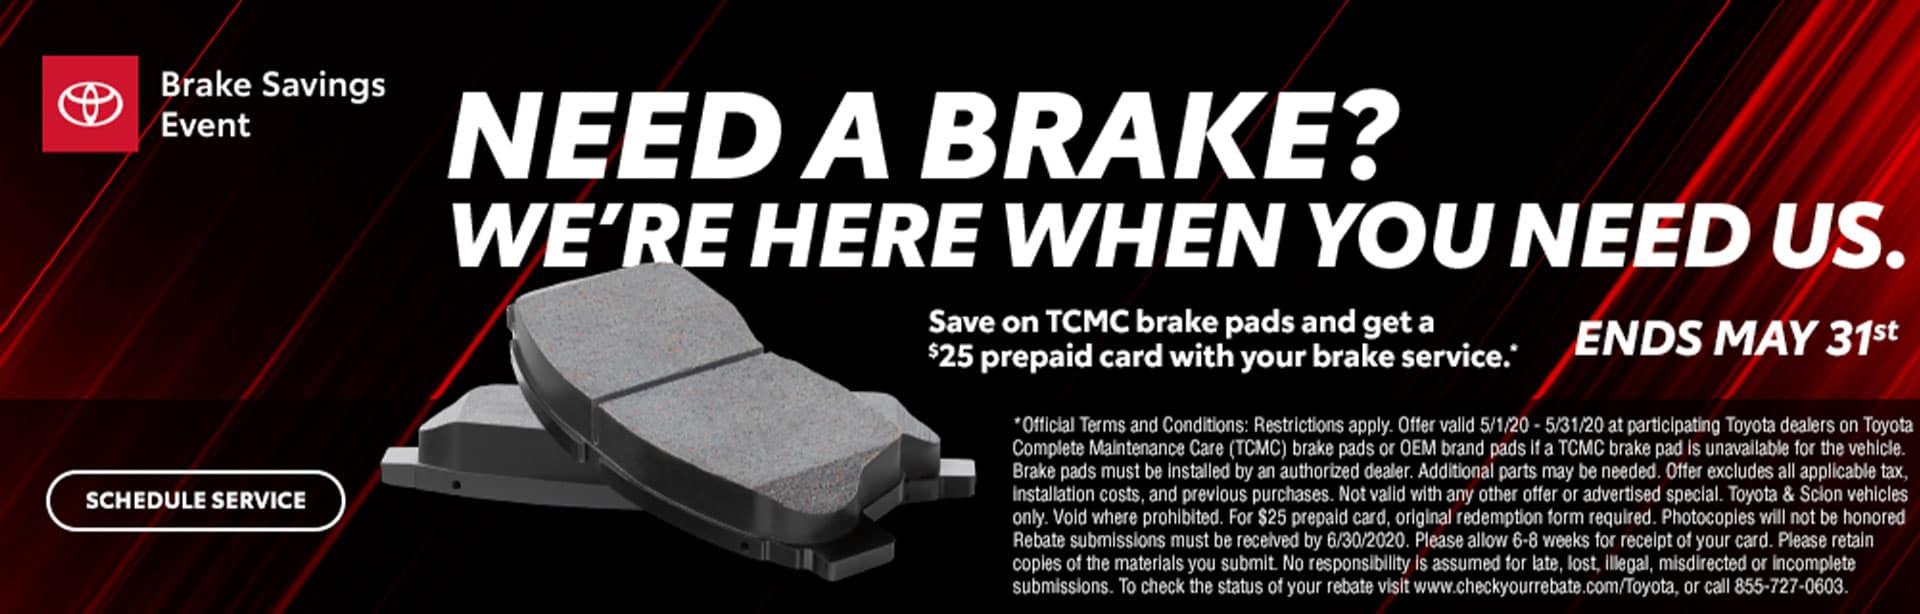 Brakes Savings at Bev Smith Toyota